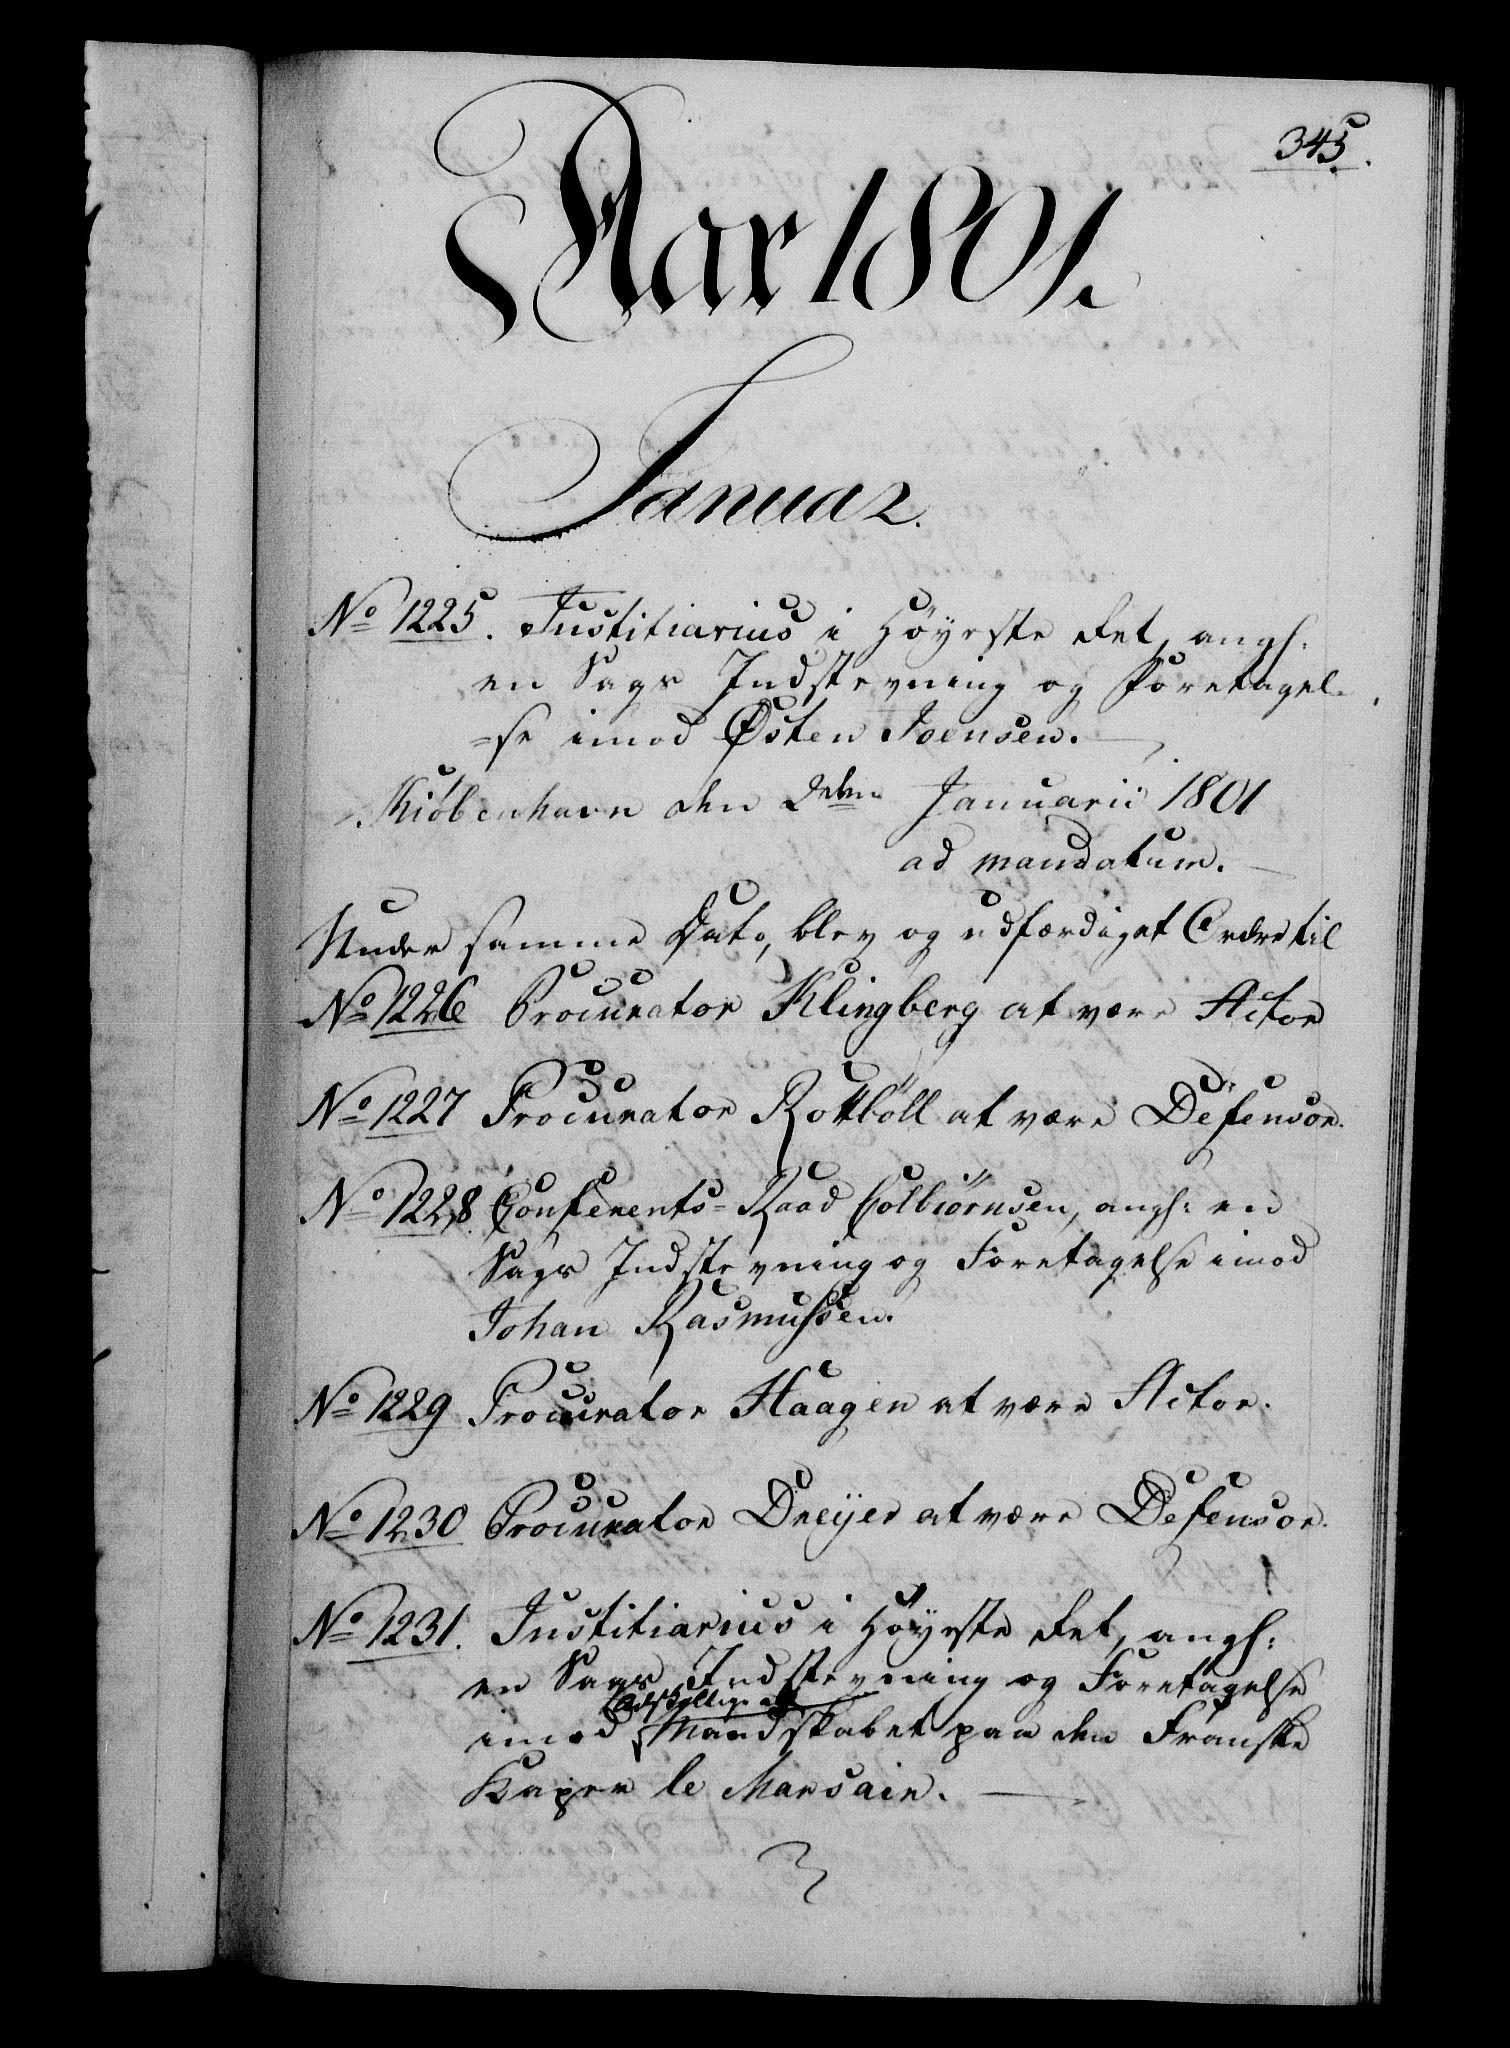 RA, Danske Kanselli 1800-1814, H/Hf/Hfb/Hfba/L0001: Registranter, 1800-1801, s. 345a